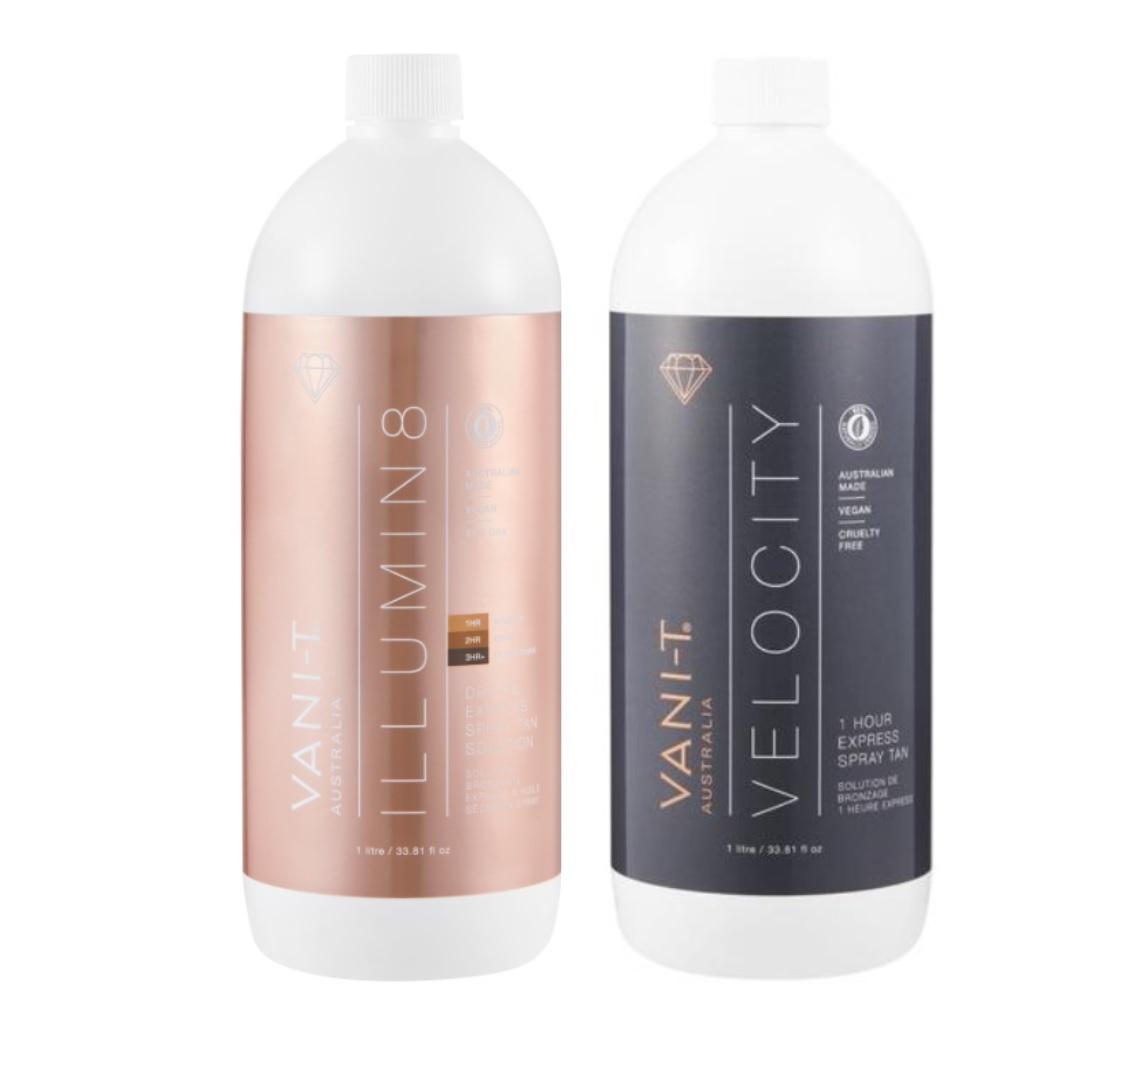 Spray Tan Vloeistof